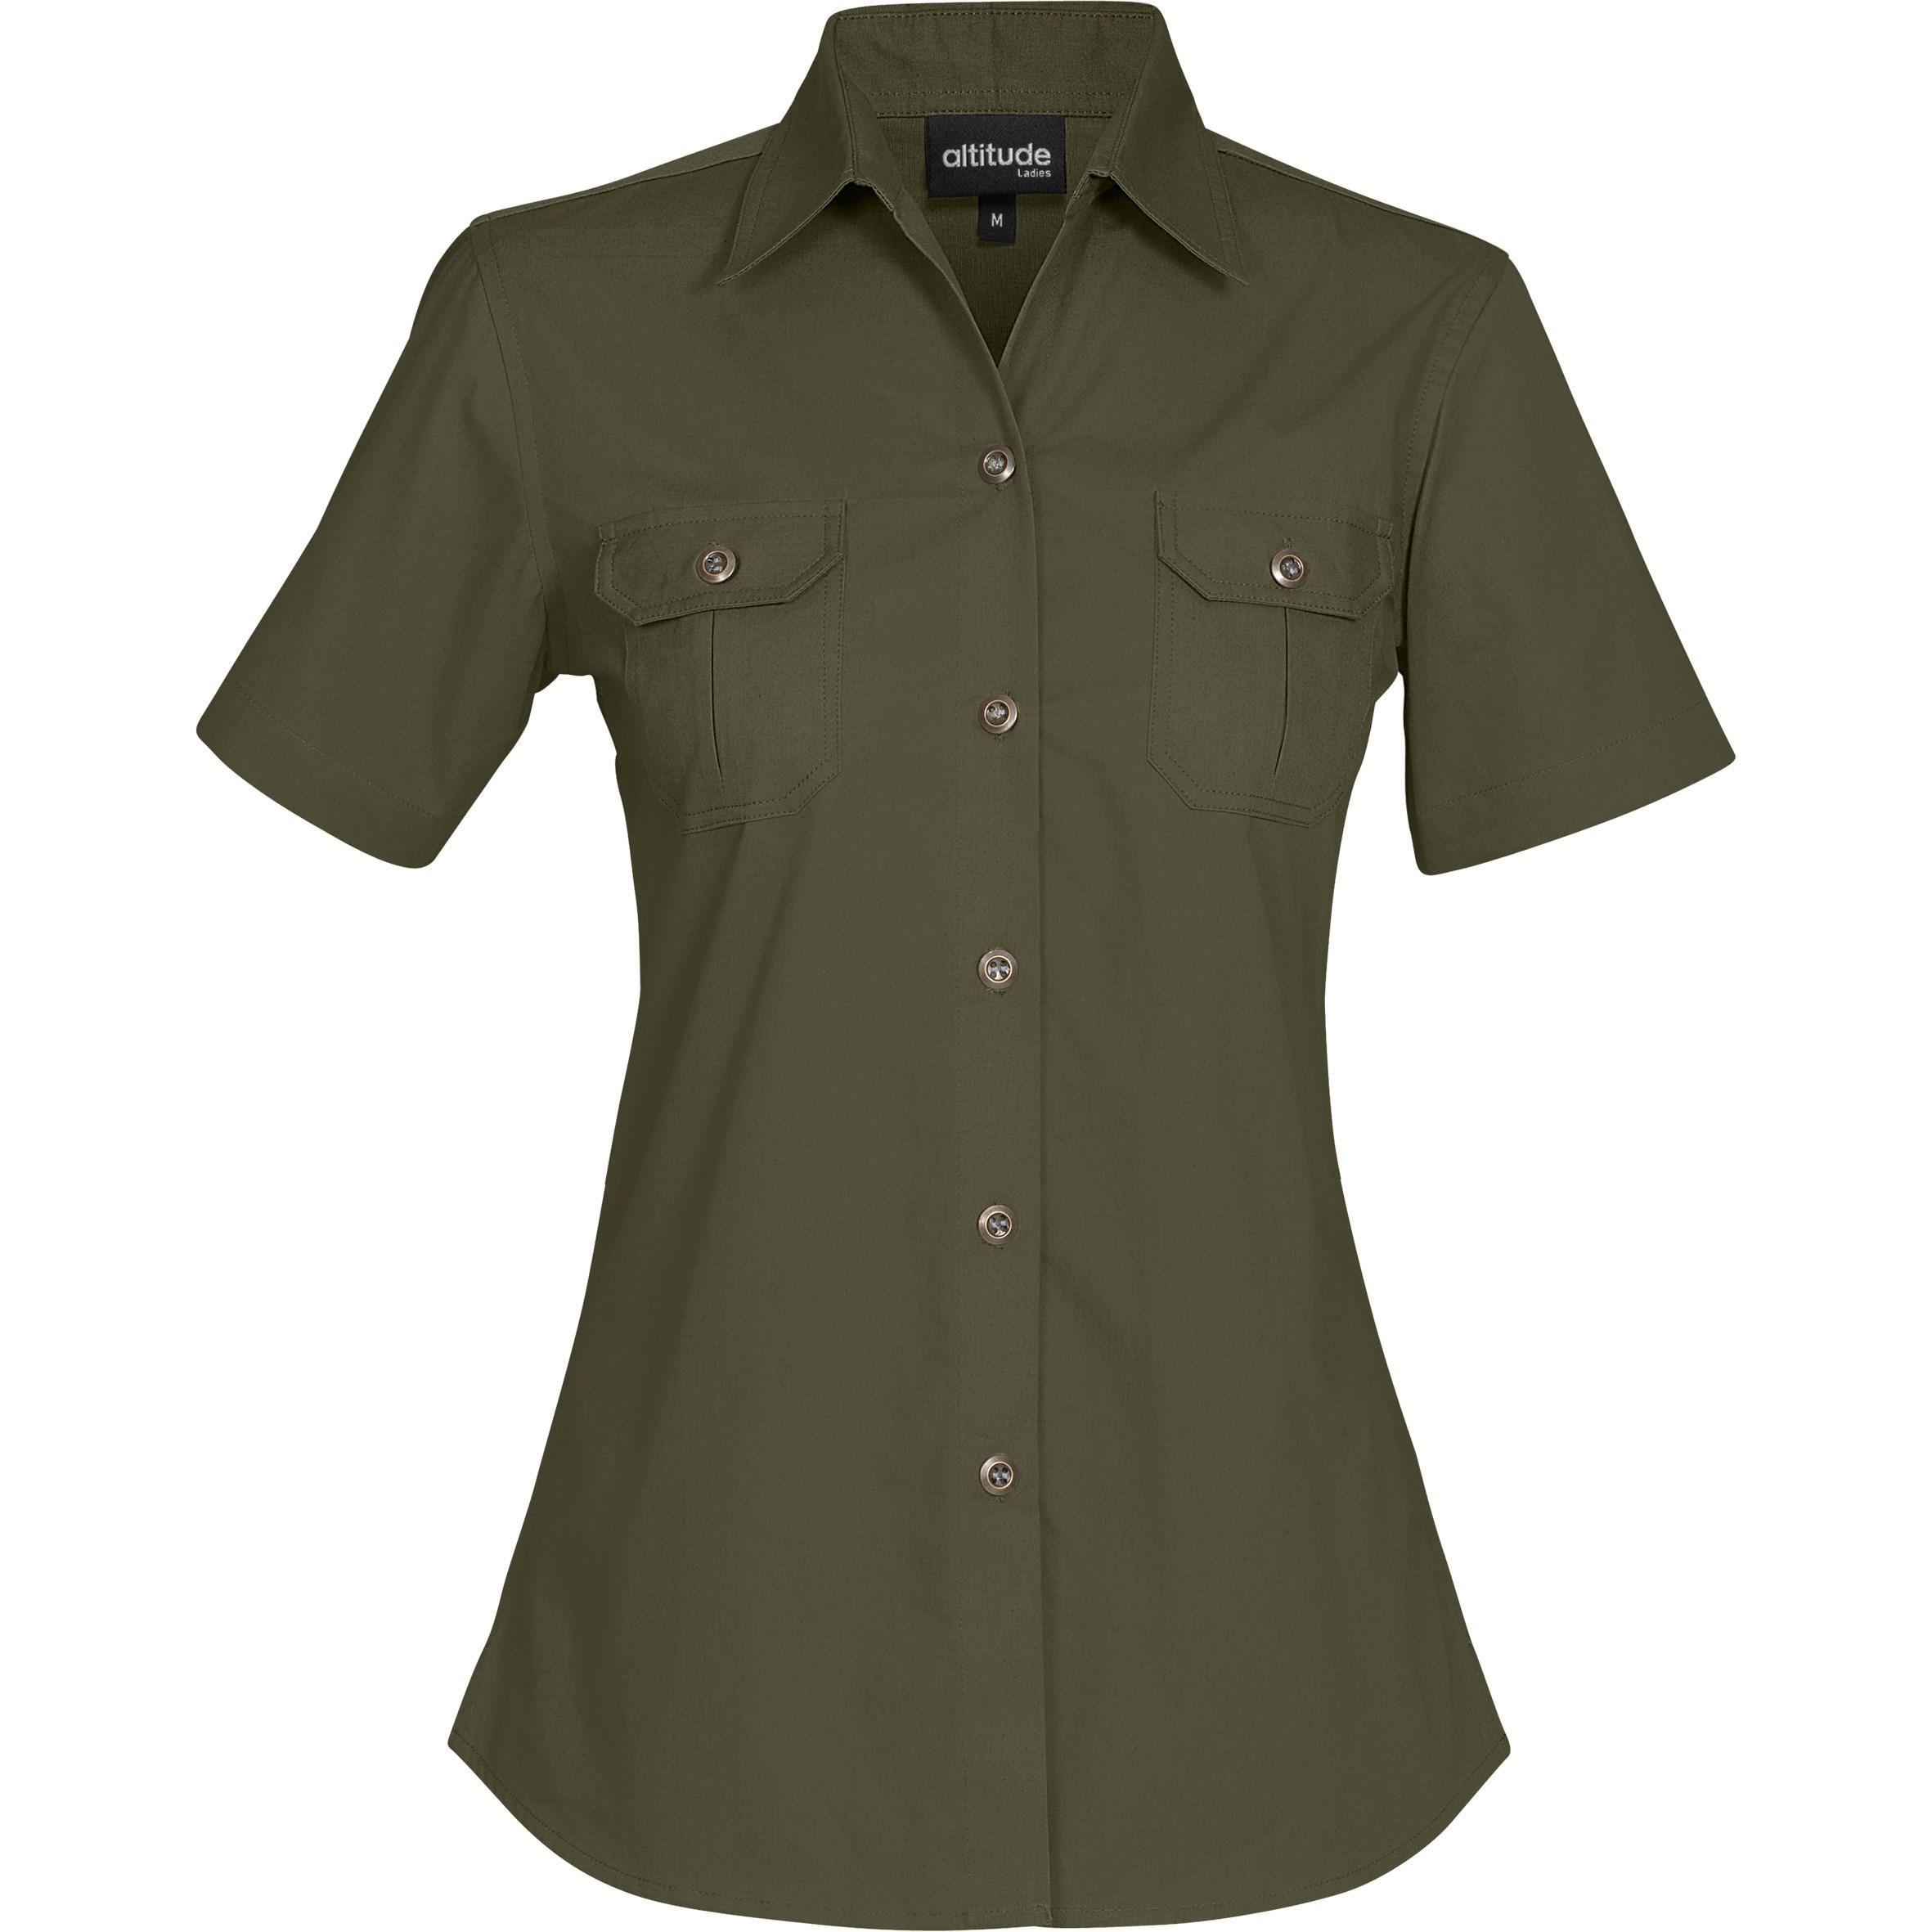 Ladies Short Sleeve Oryx Bush Shirt - Military Green Only